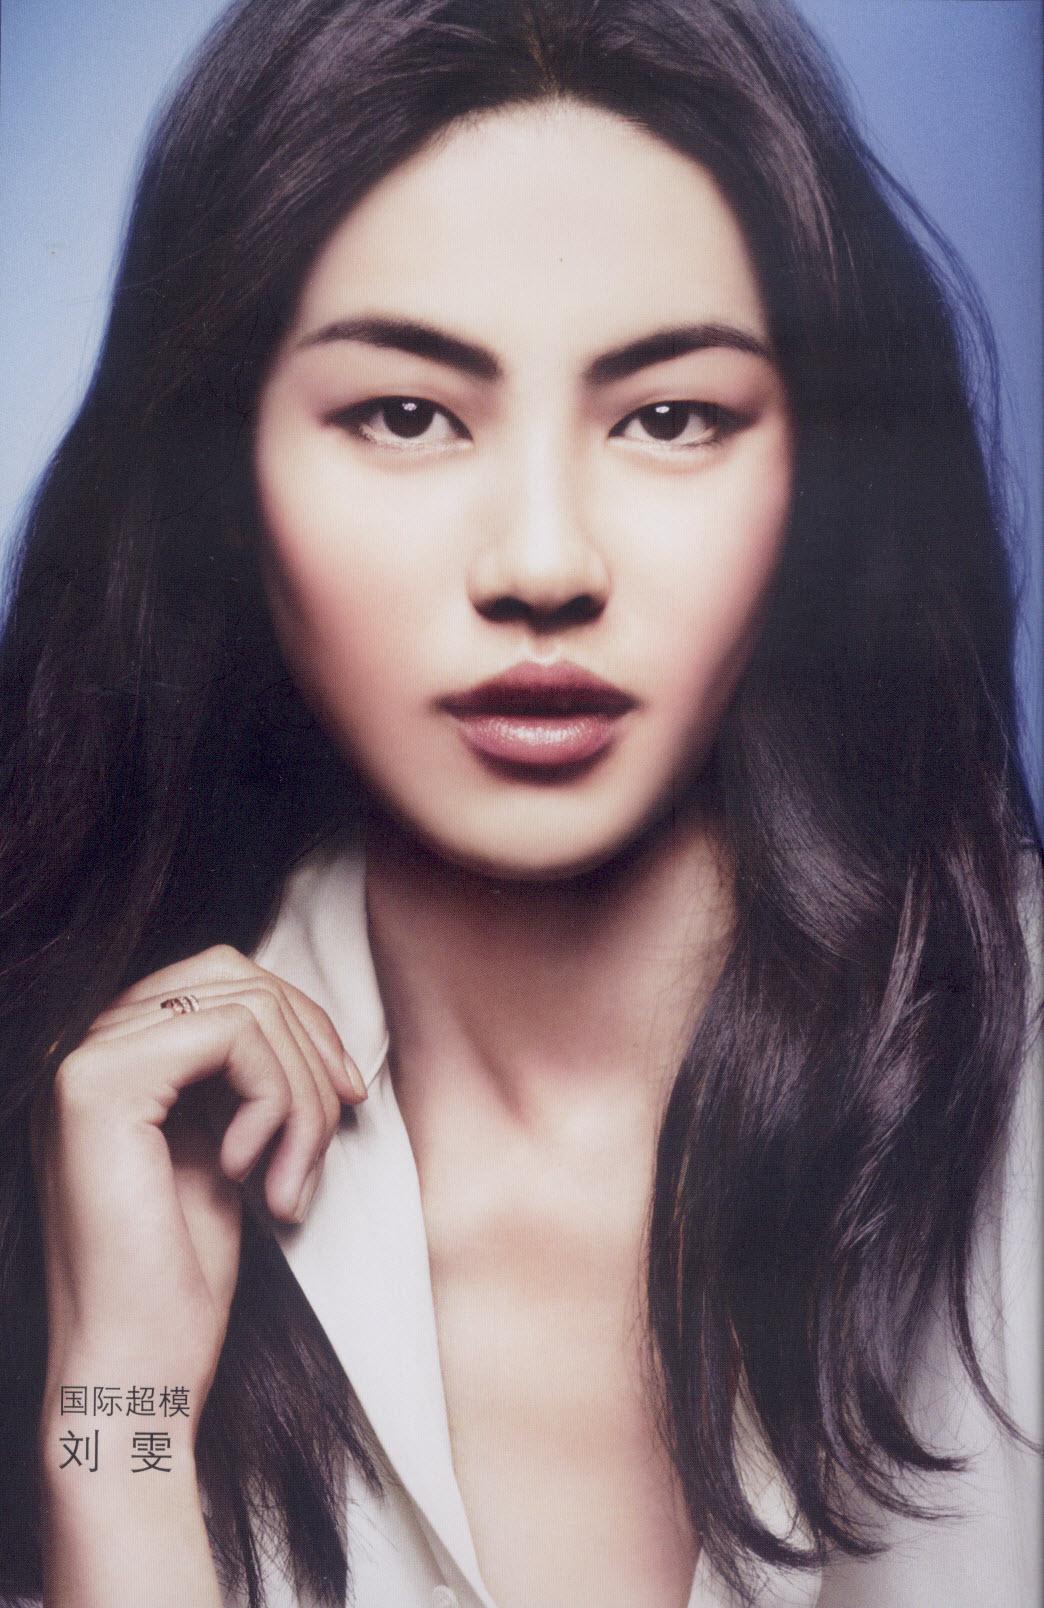 Liu wen estee lauder-1258